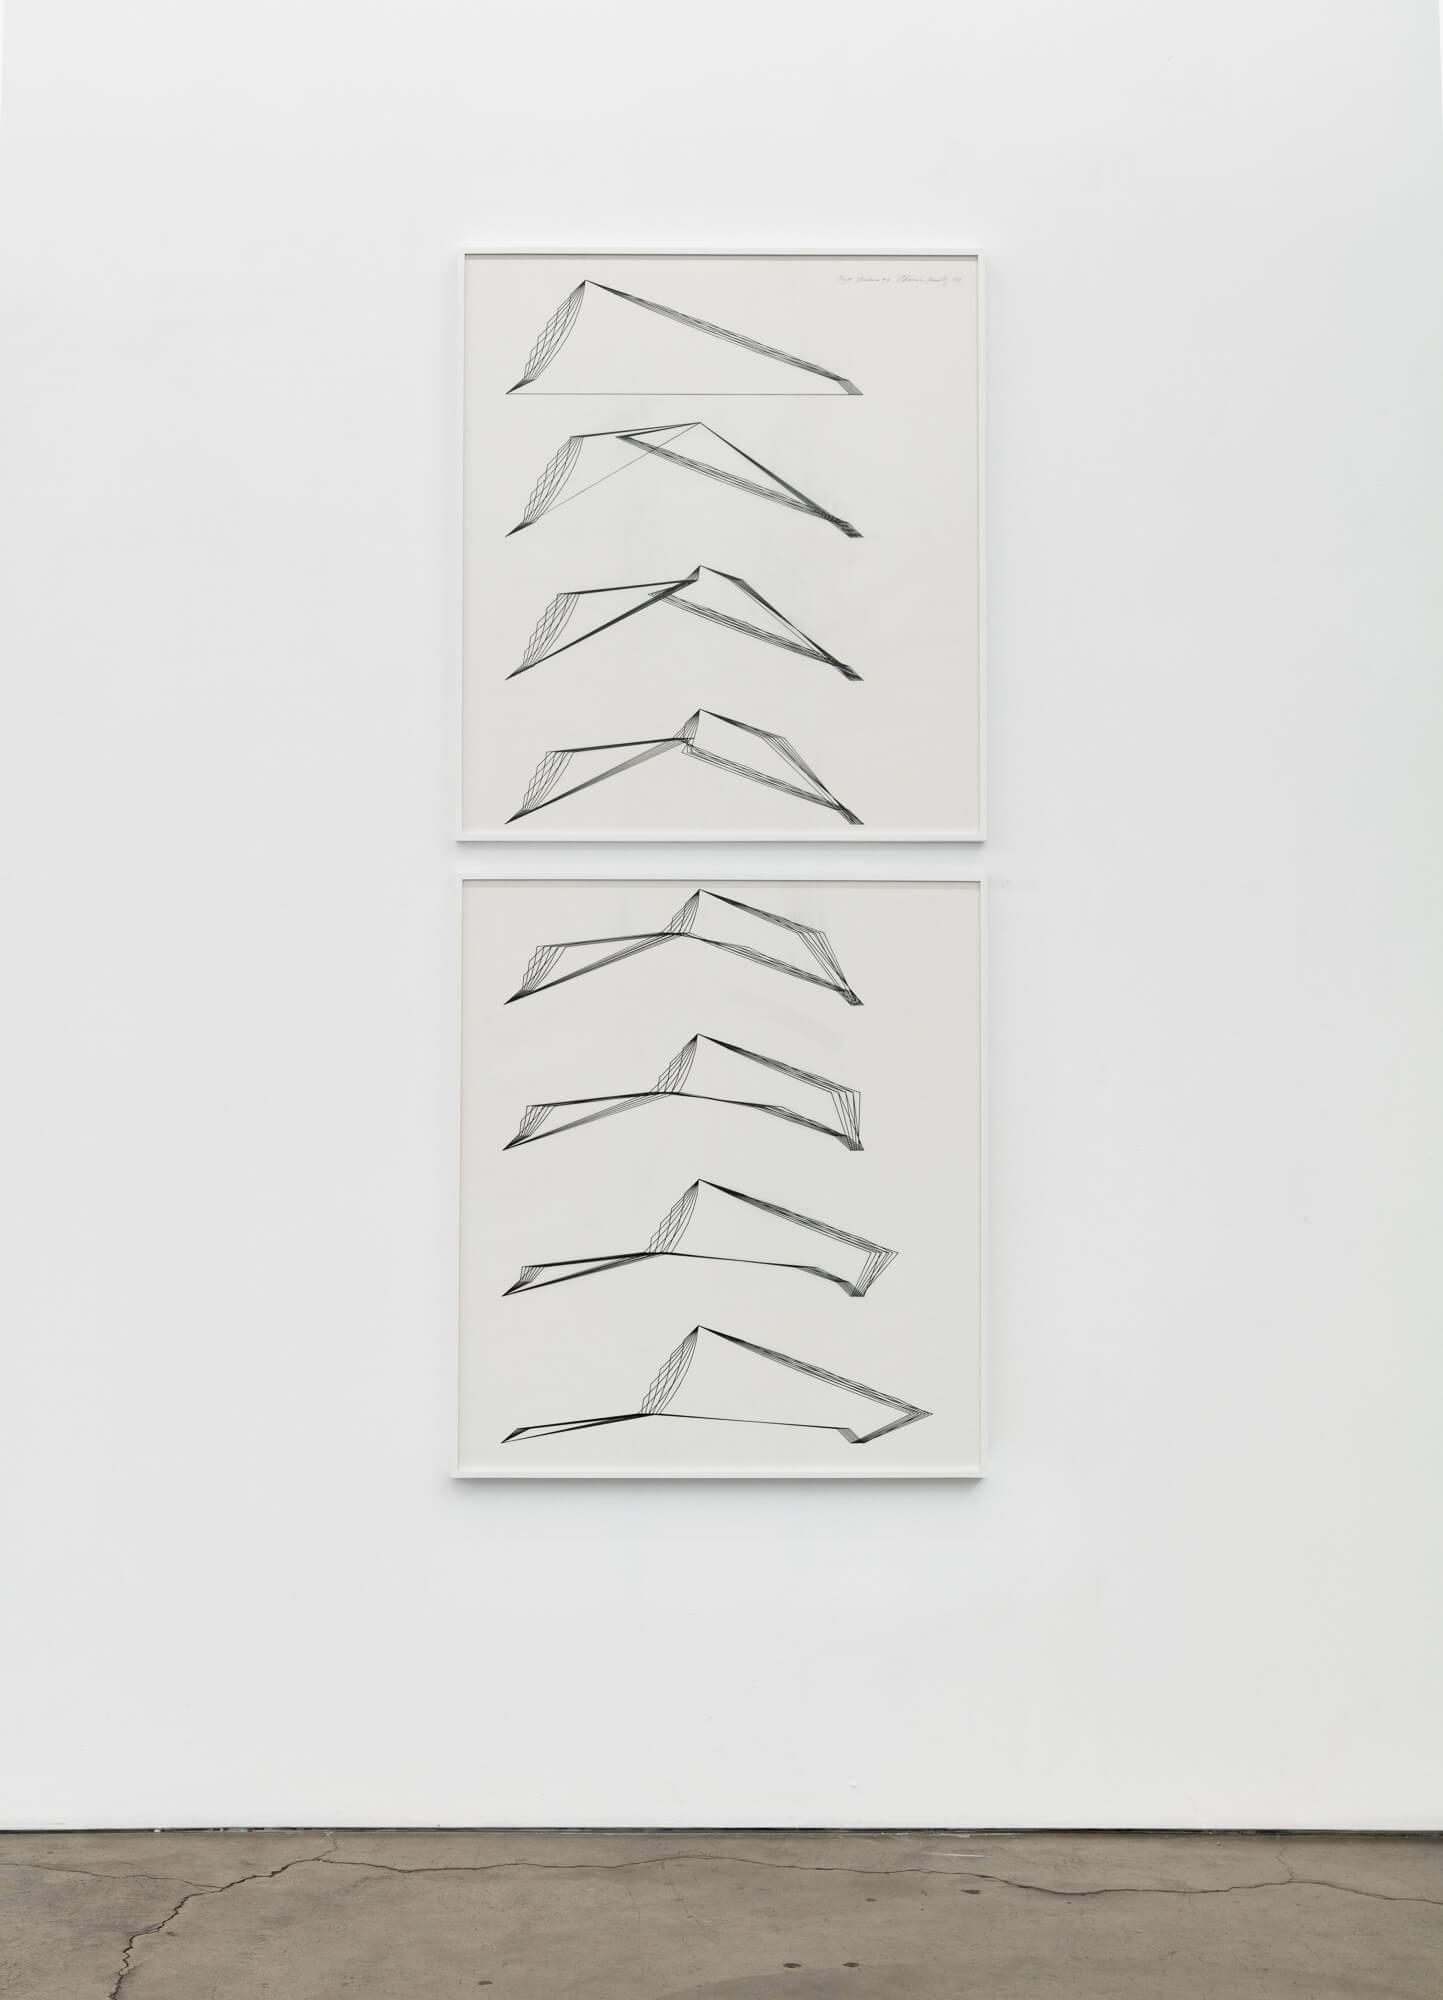 Horwitz, Eight Structures #3, 1980 (CH 80.012)(#165)